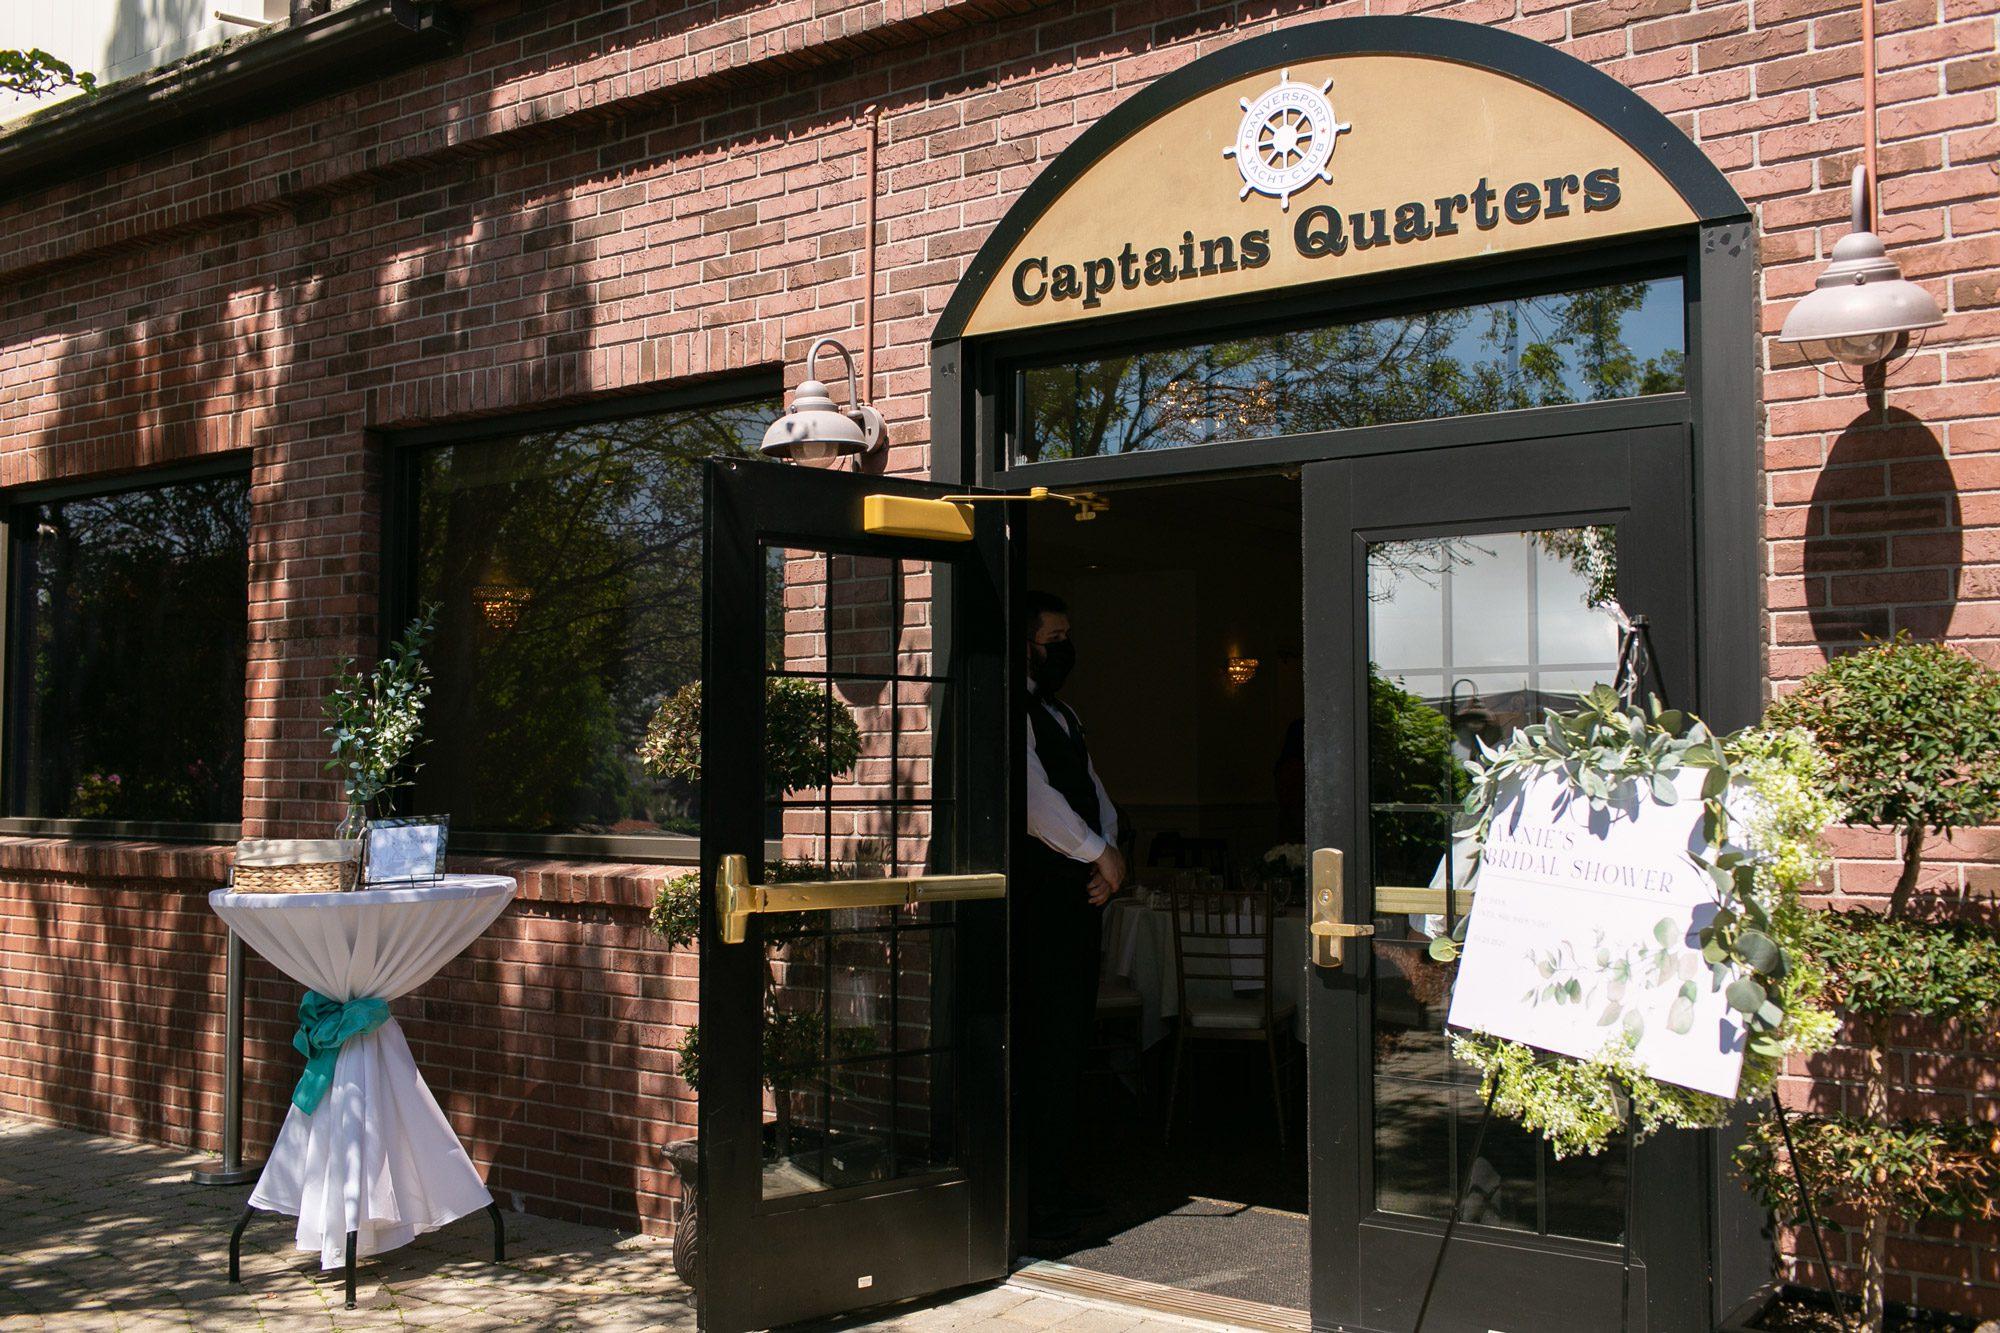 The entrance to Captain's Quarters at Danversport